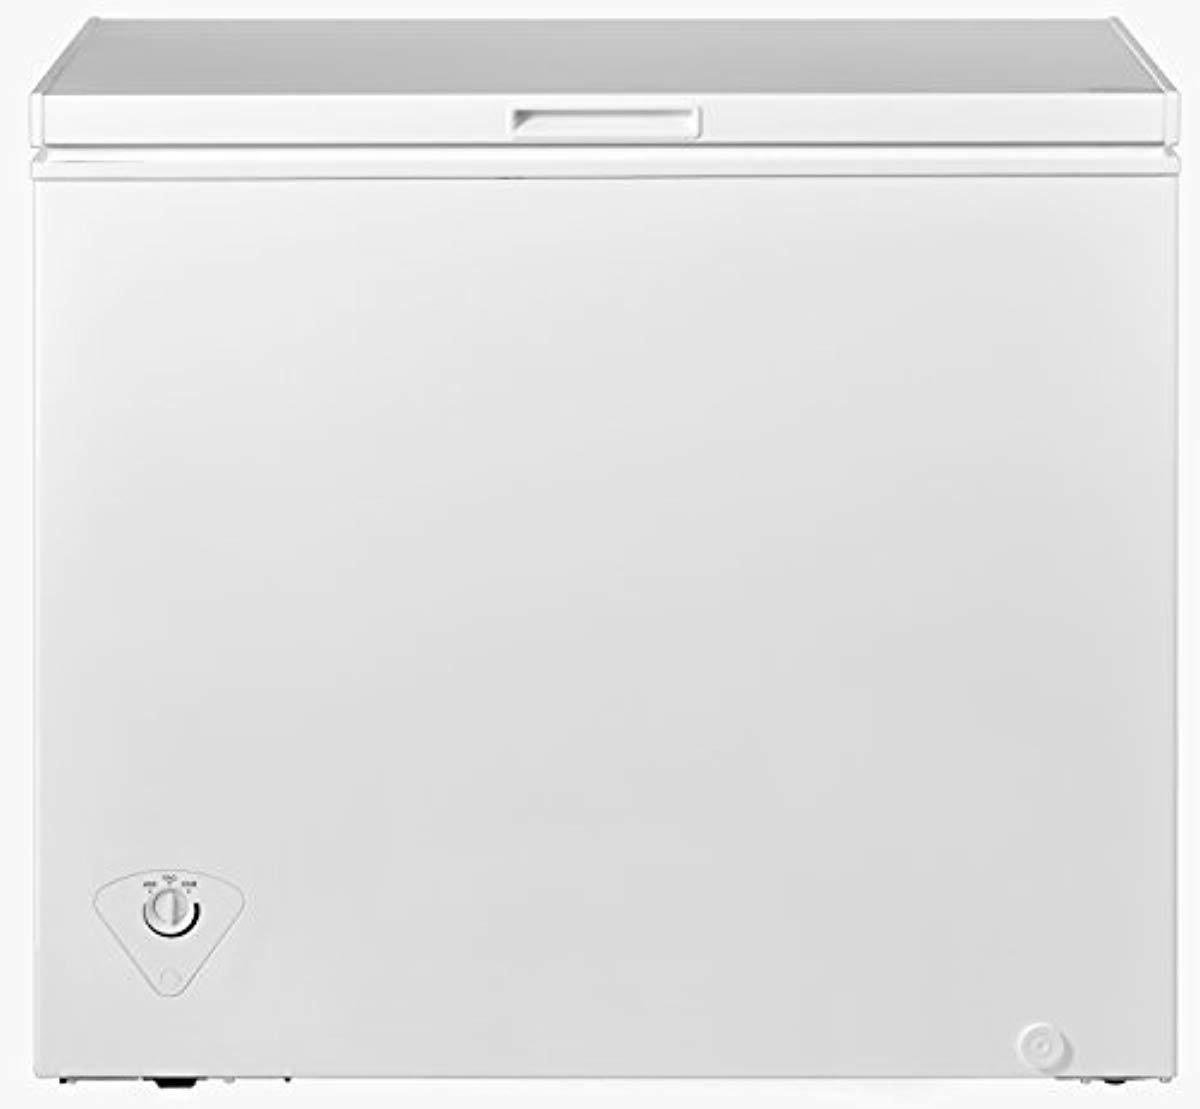 mrc070s0aww chest freezer 7 0 cubic feet